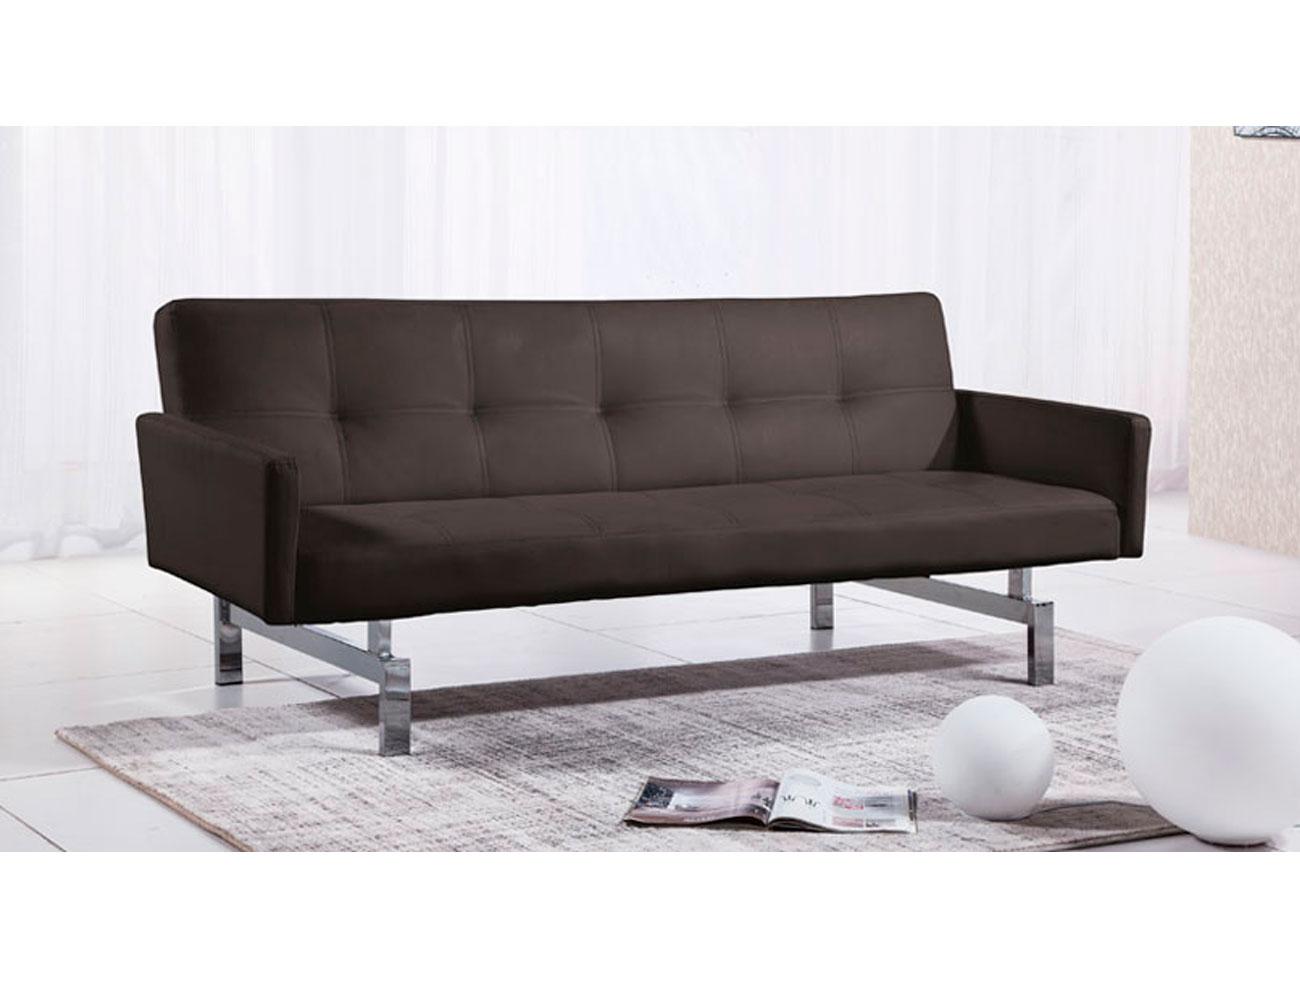 Sofa cama con brazos simil piel chocolate